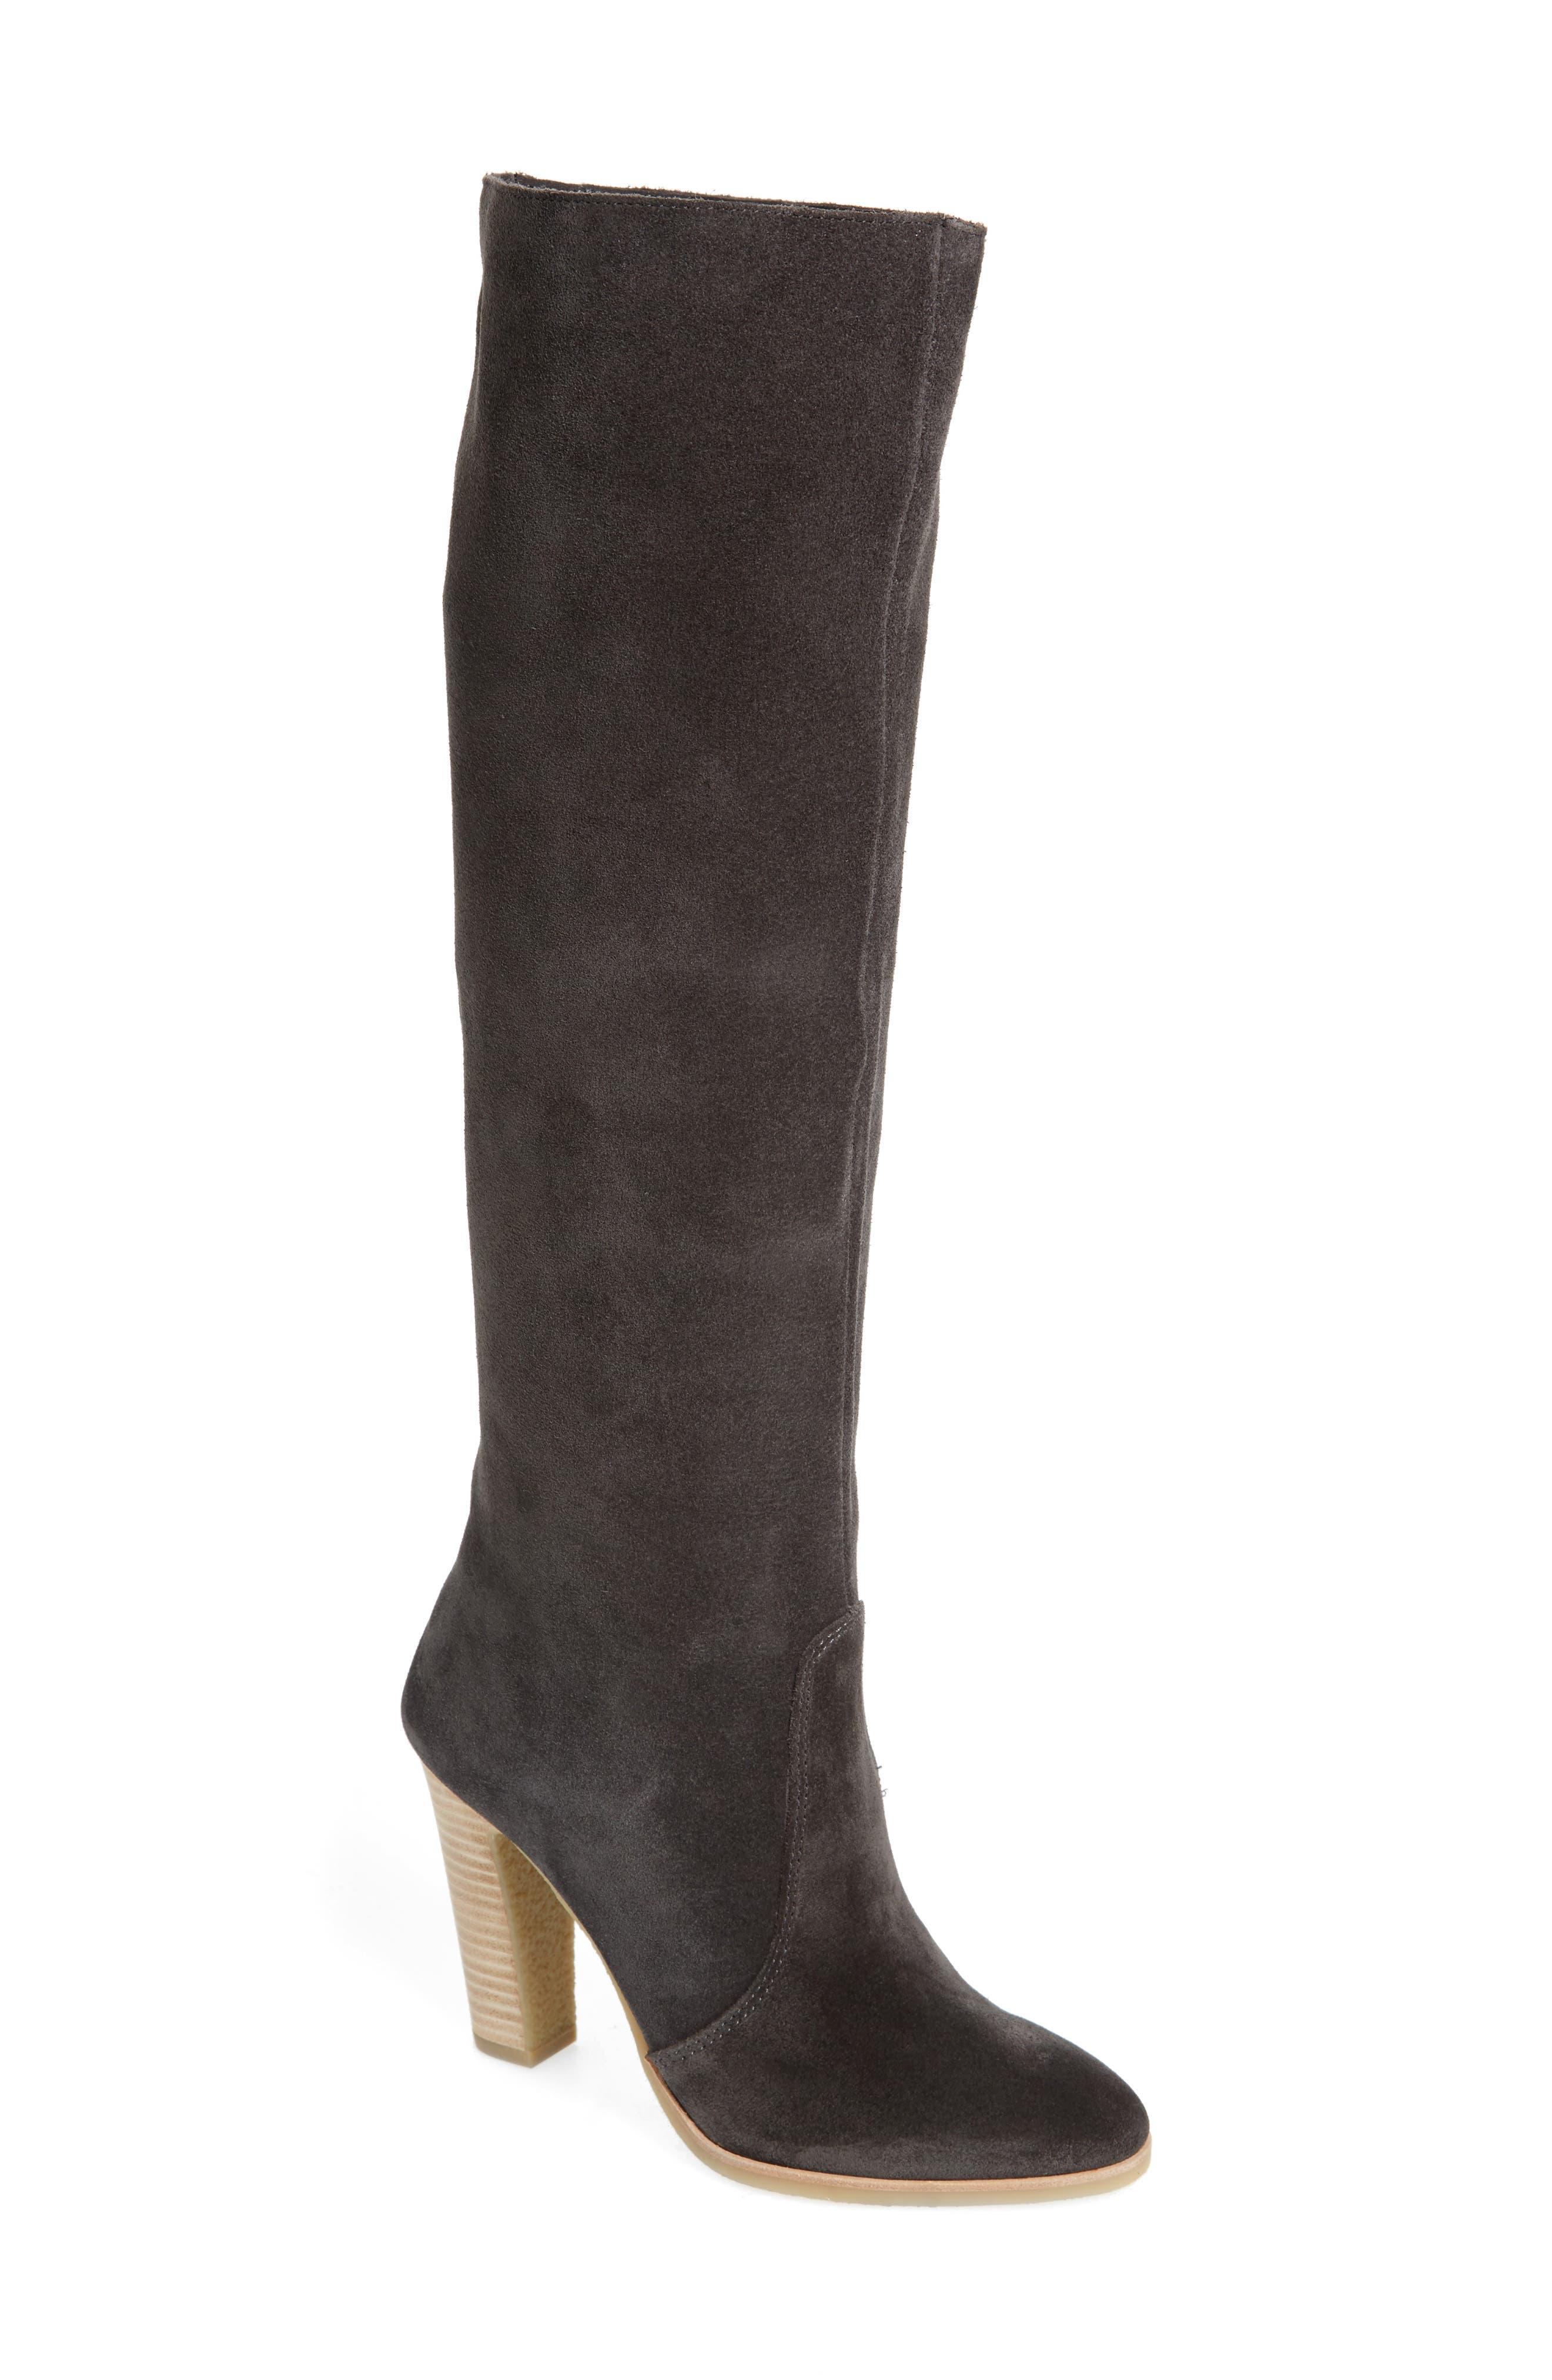 Celine Knee-High Boot,                         Main,                         color, 020